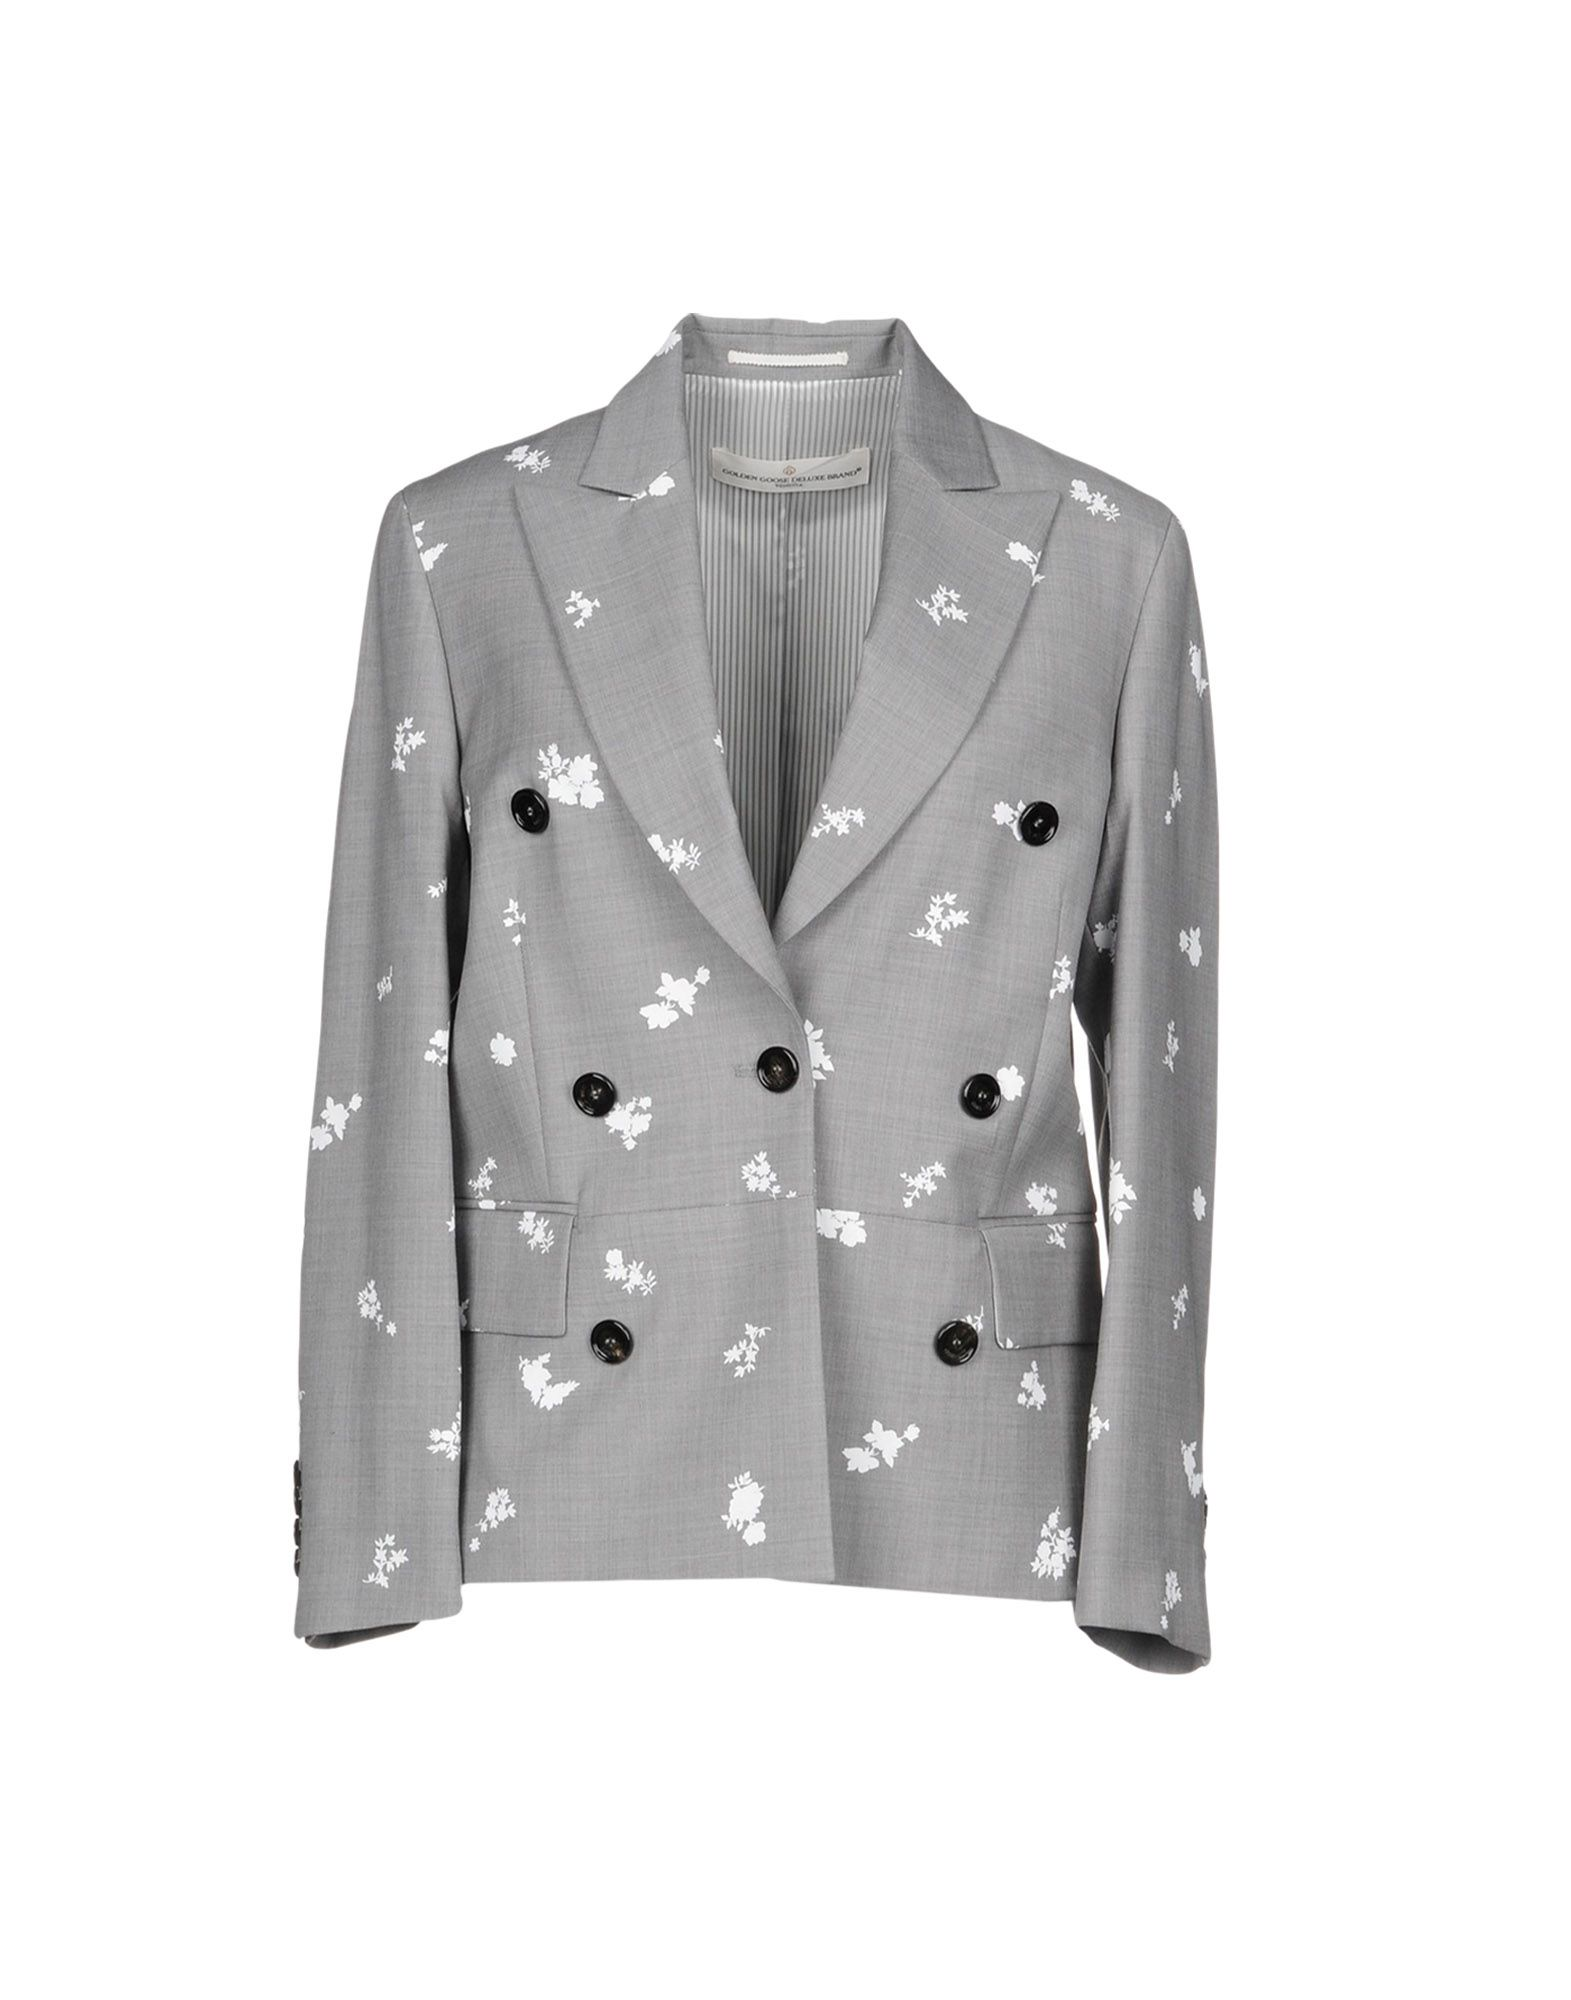 GOLDEN GOOSE DELUXE BRAND Пиджак куртка canada goose montebello parka